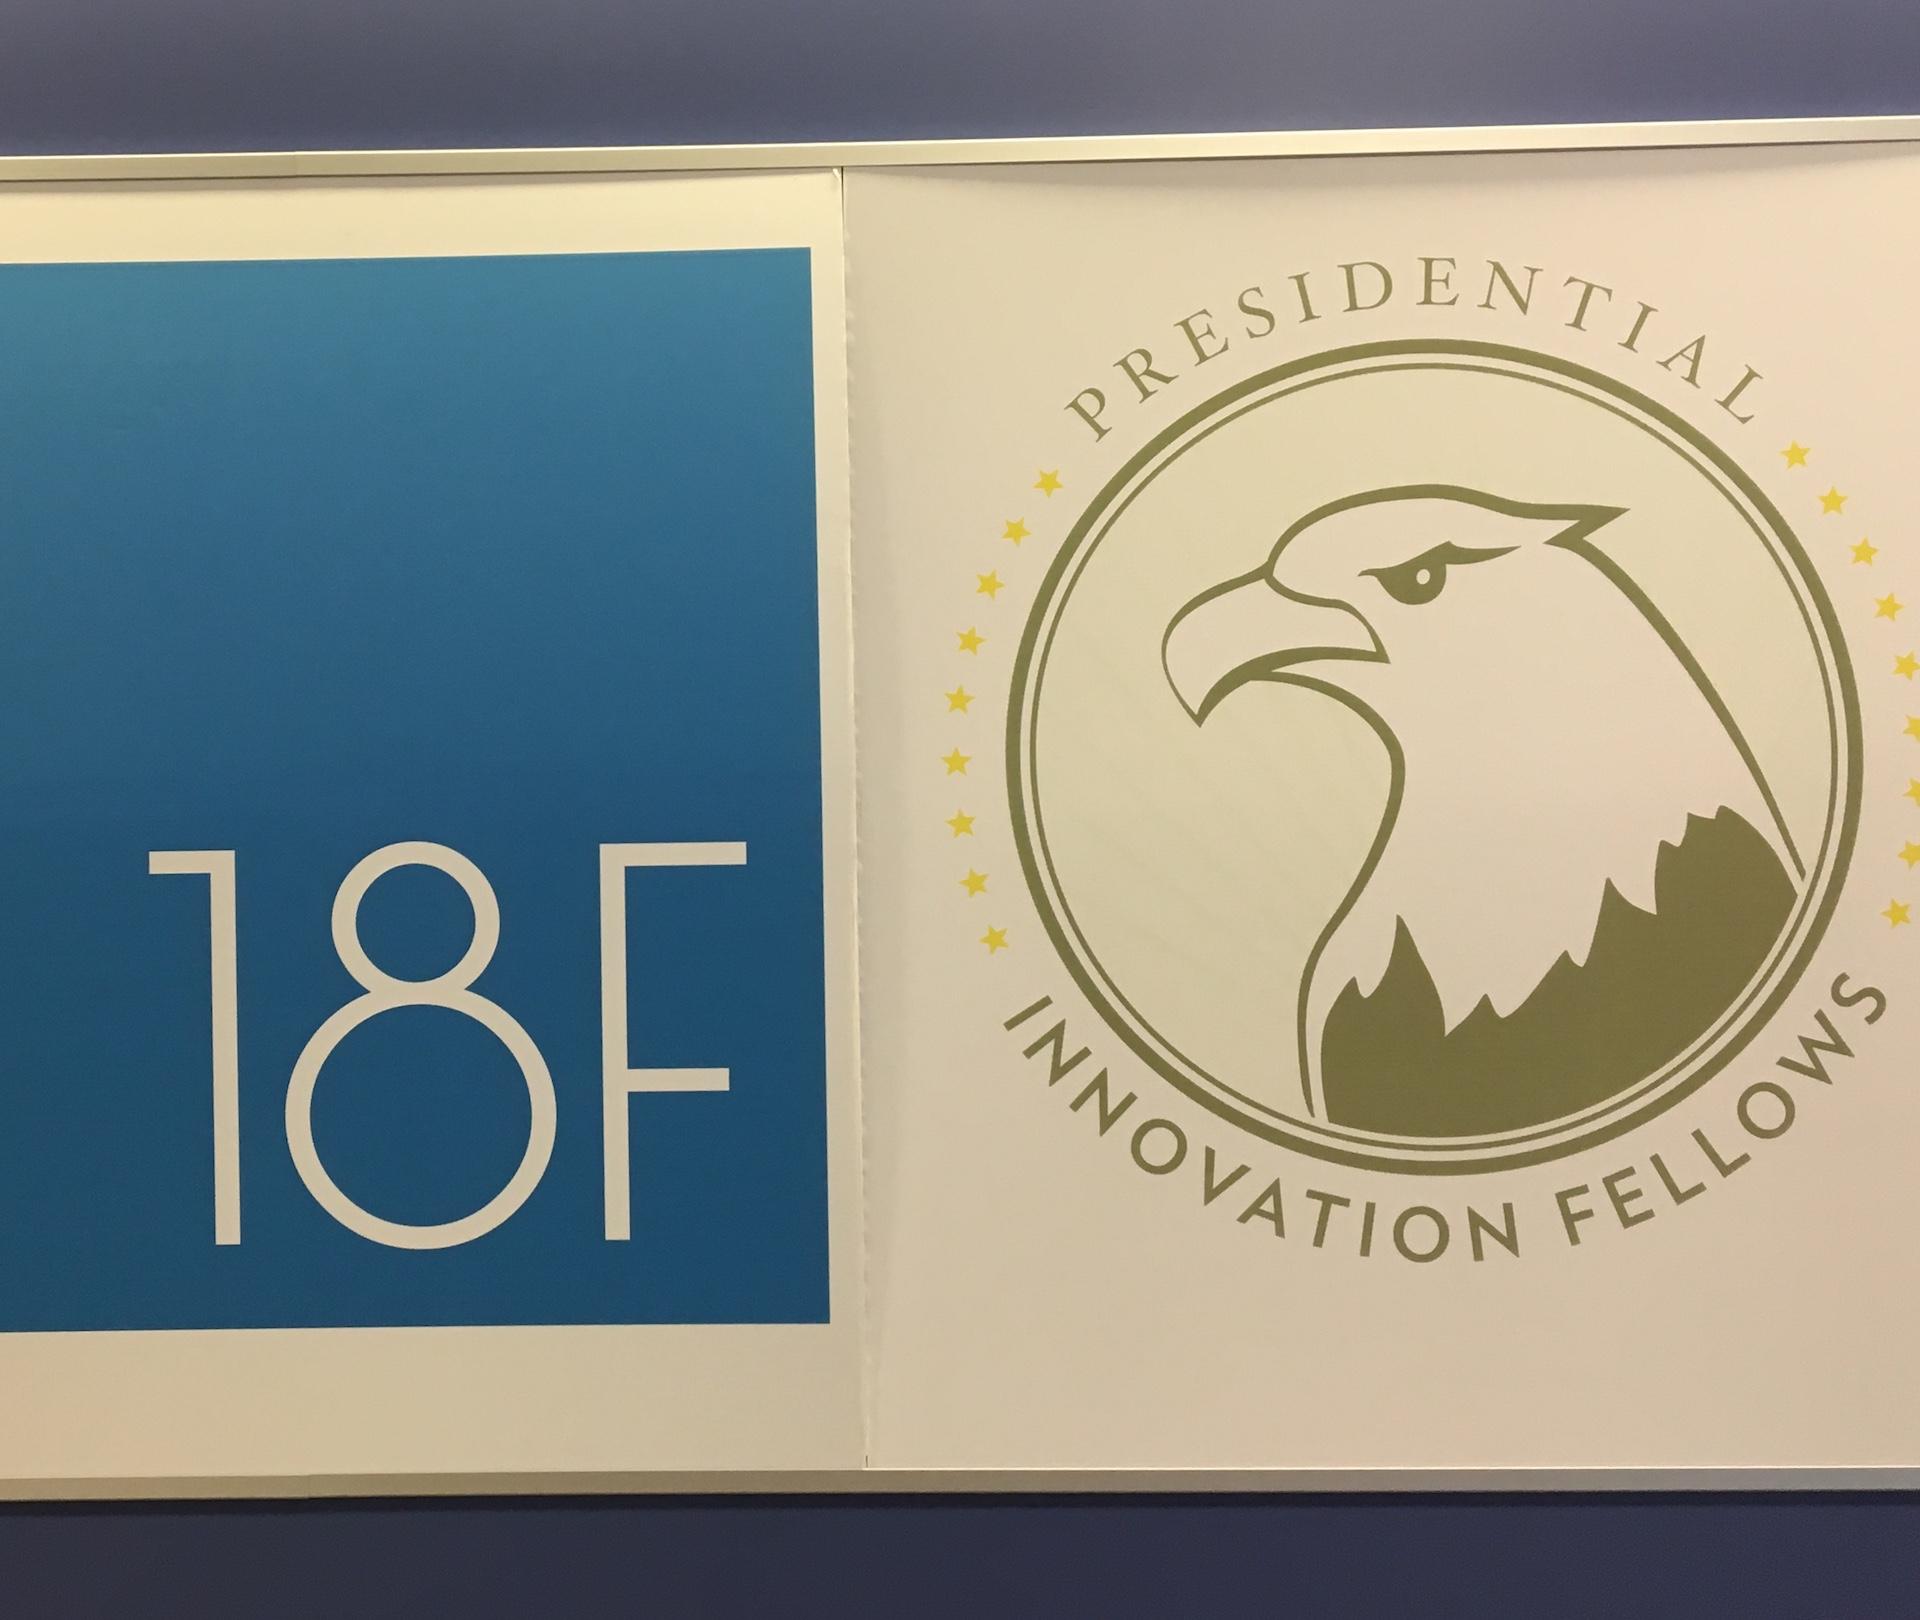 PIF, Presidential Innovation Fellows, 18F